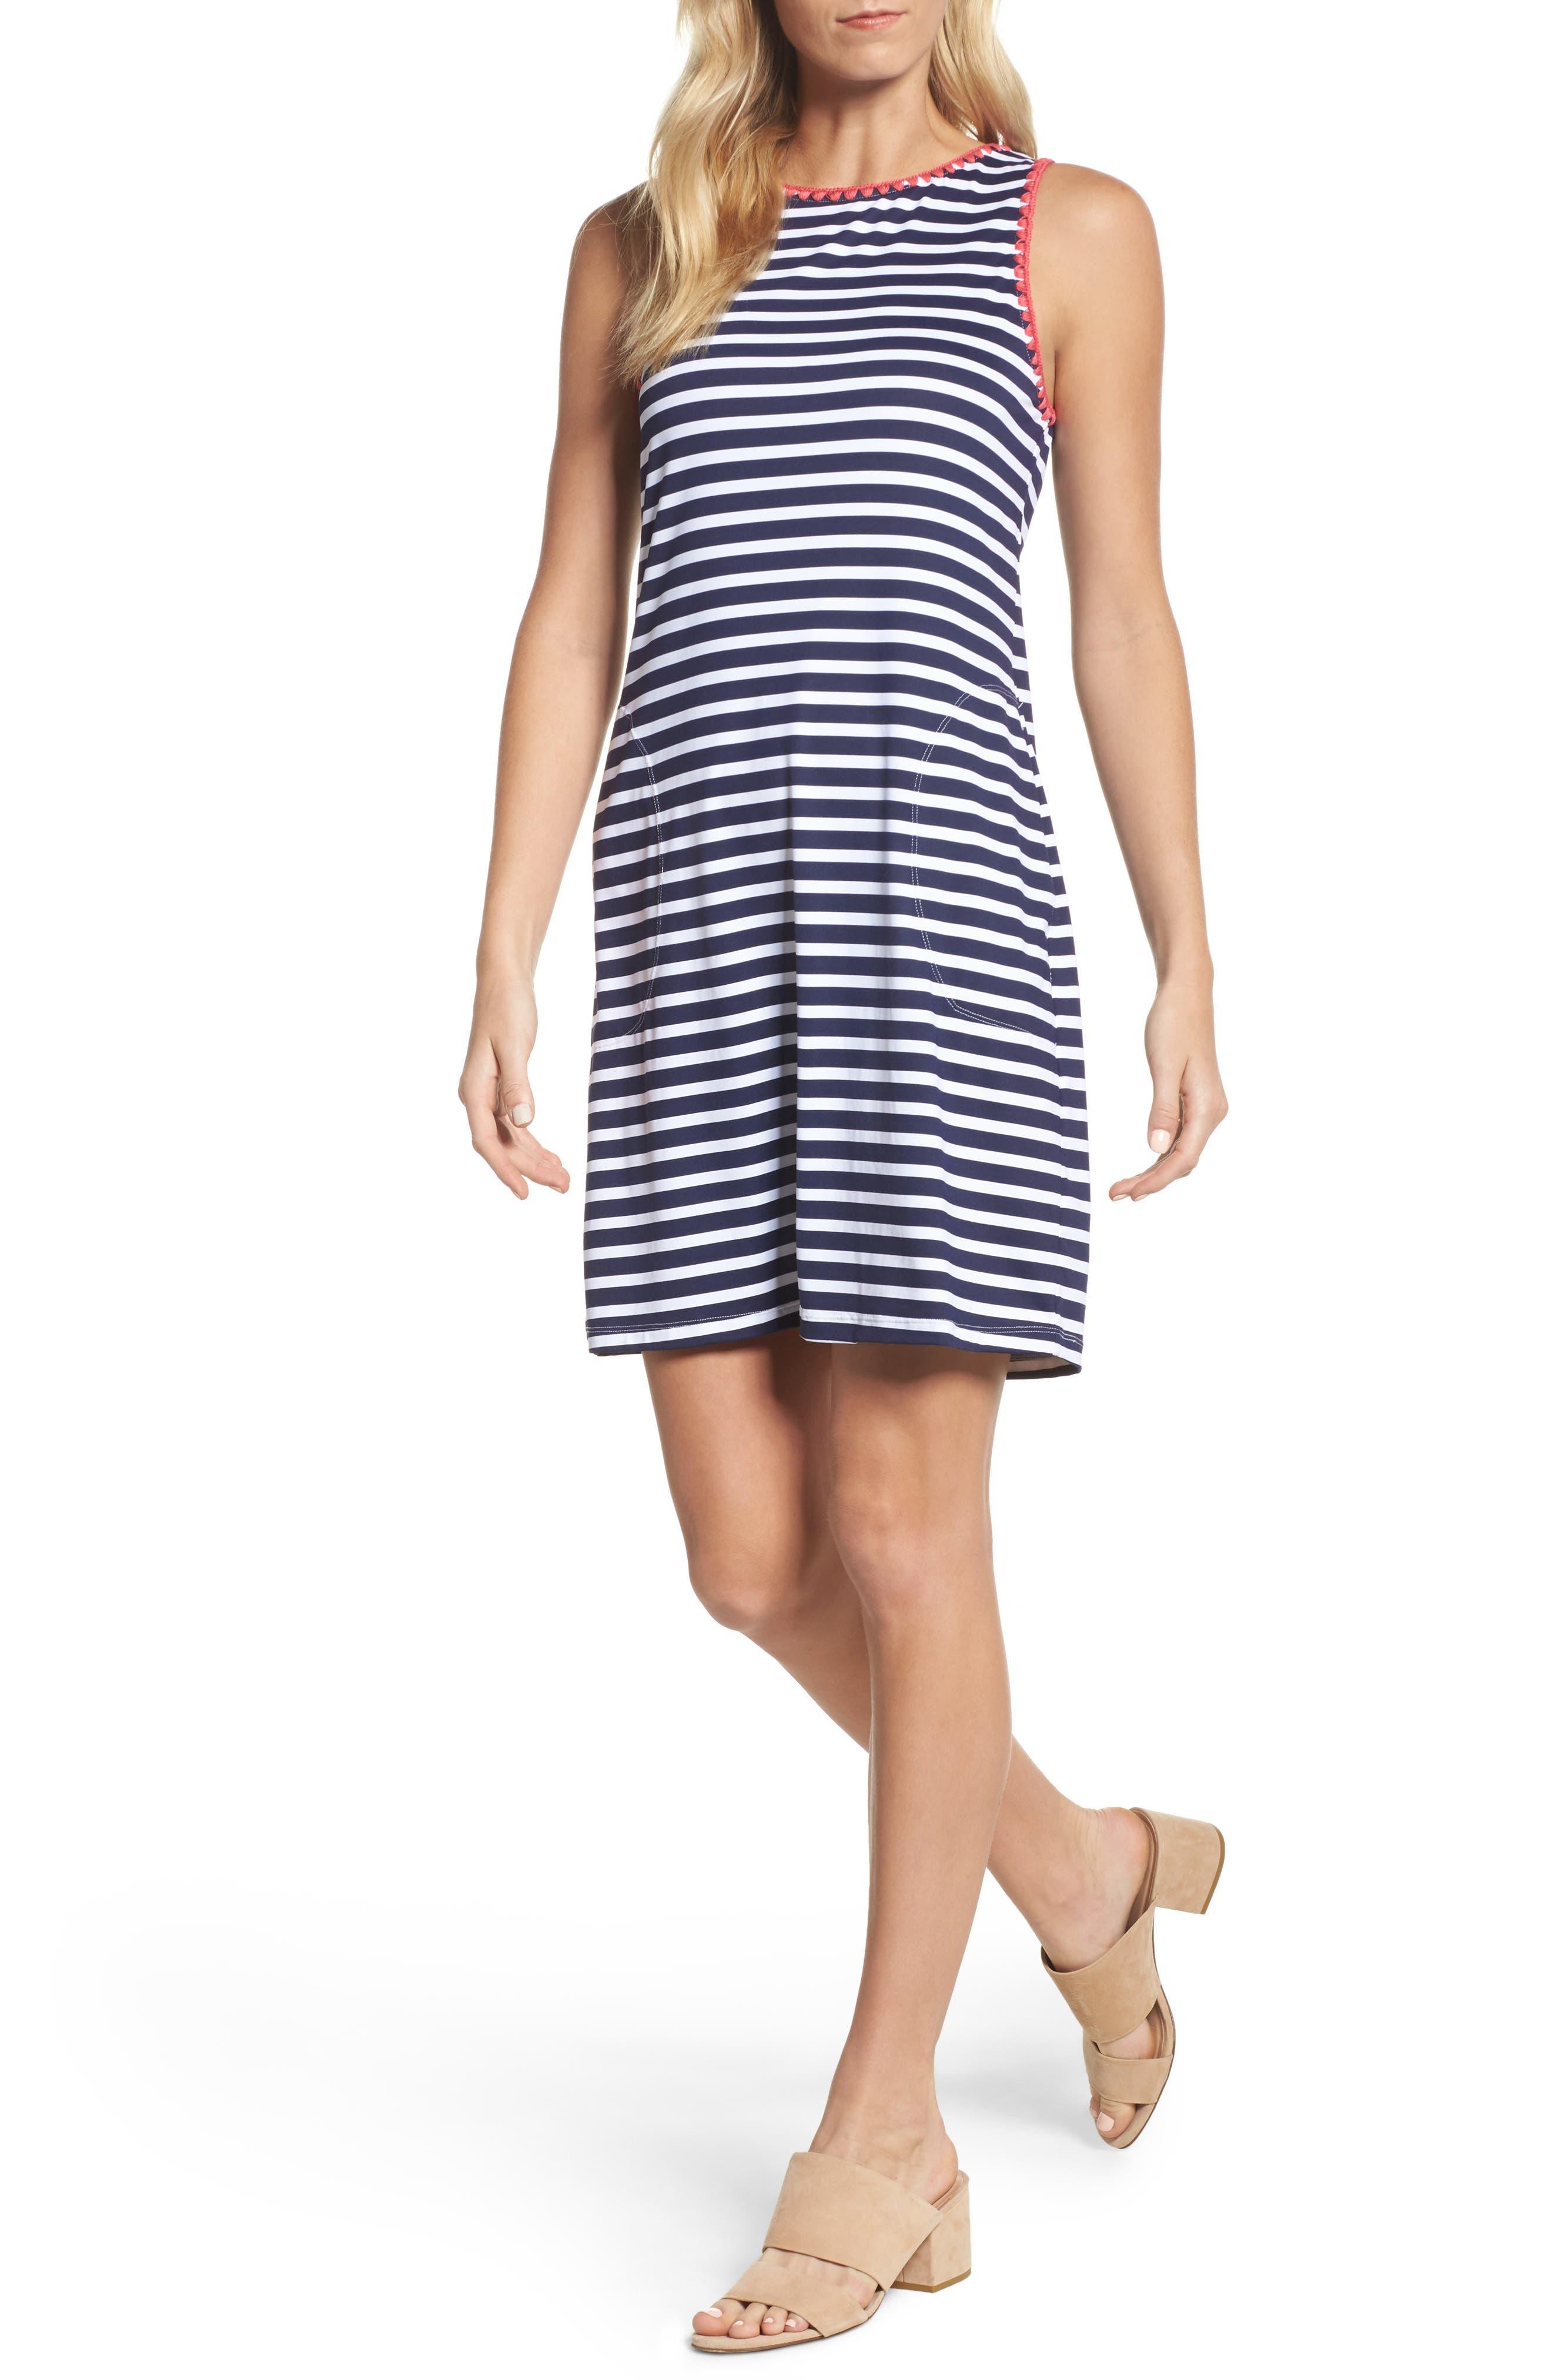 Alternate Image 1 Selected - Tommy Bahama Breton Stripe Cover-Up Dress